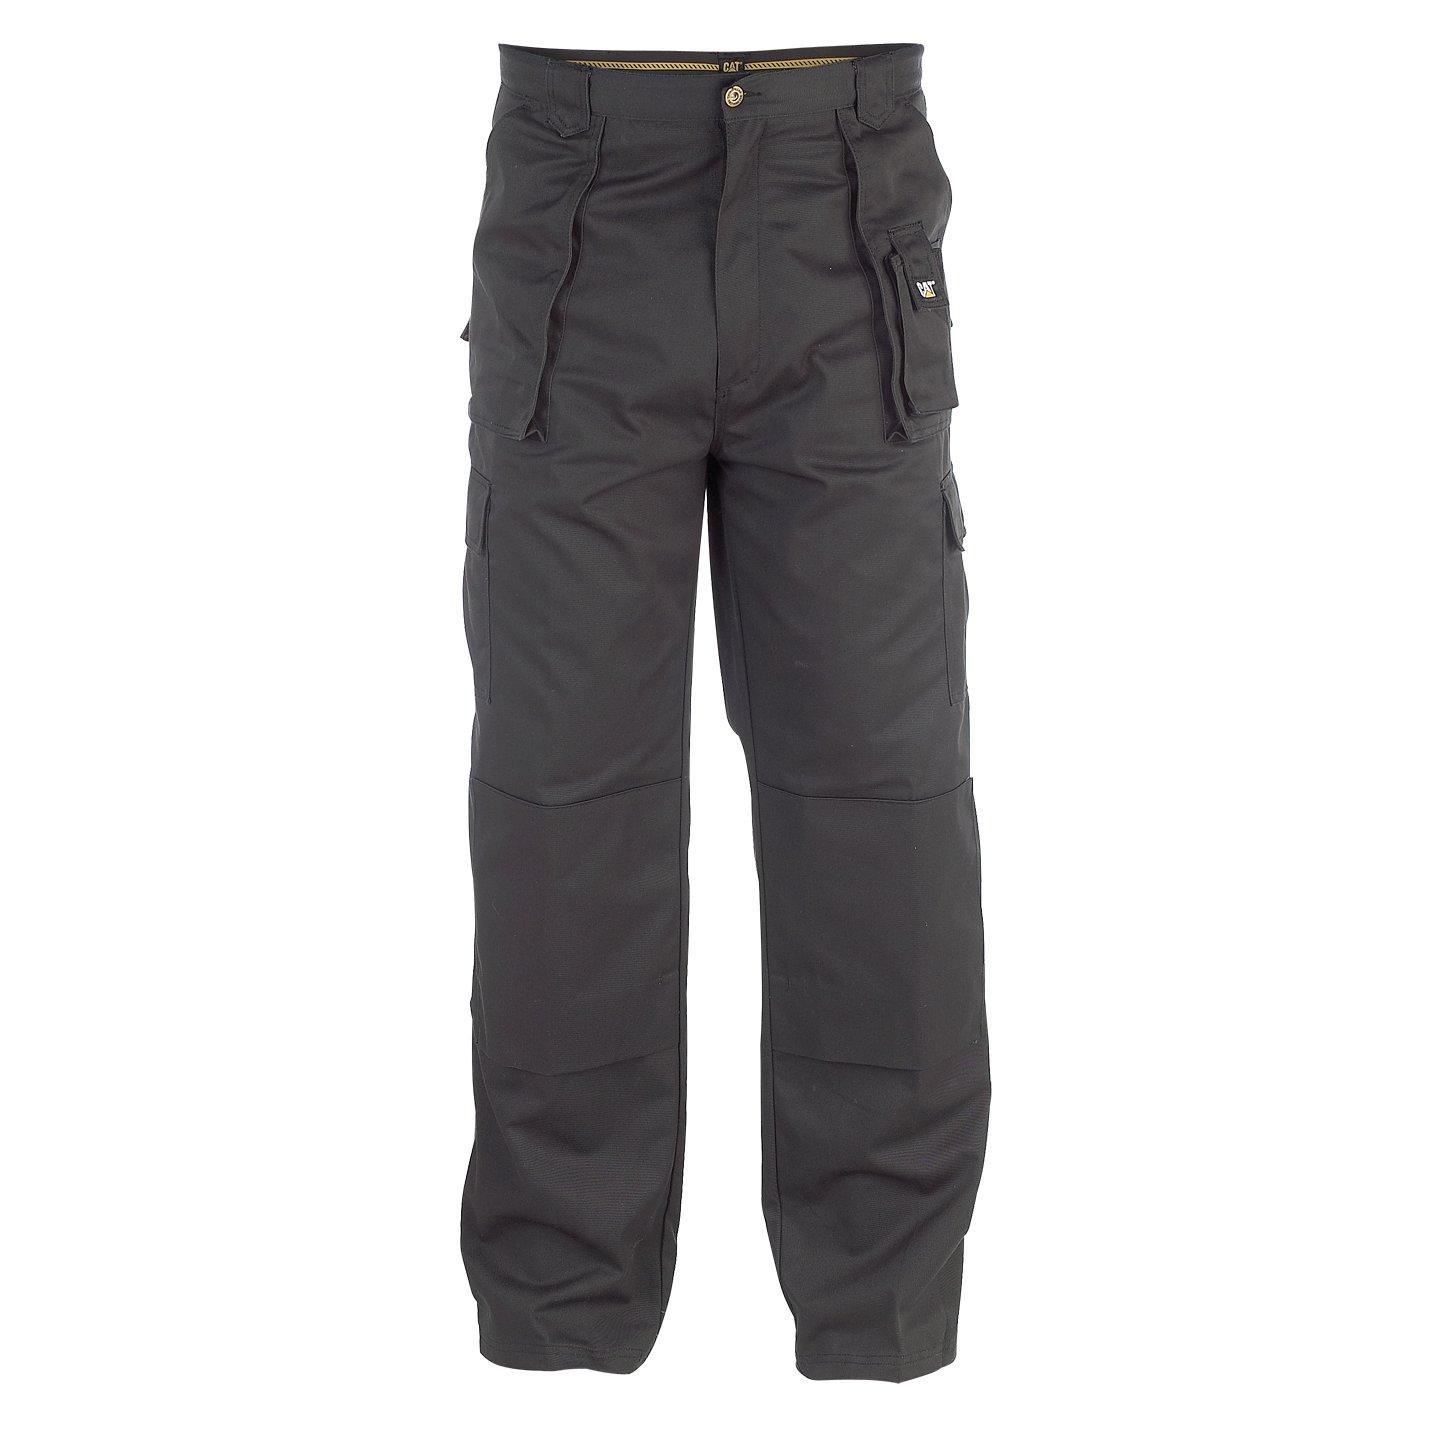 Caterpillar-Pantalones-trabajo-C820-Cargo-hombre-Longitud-pierna-short